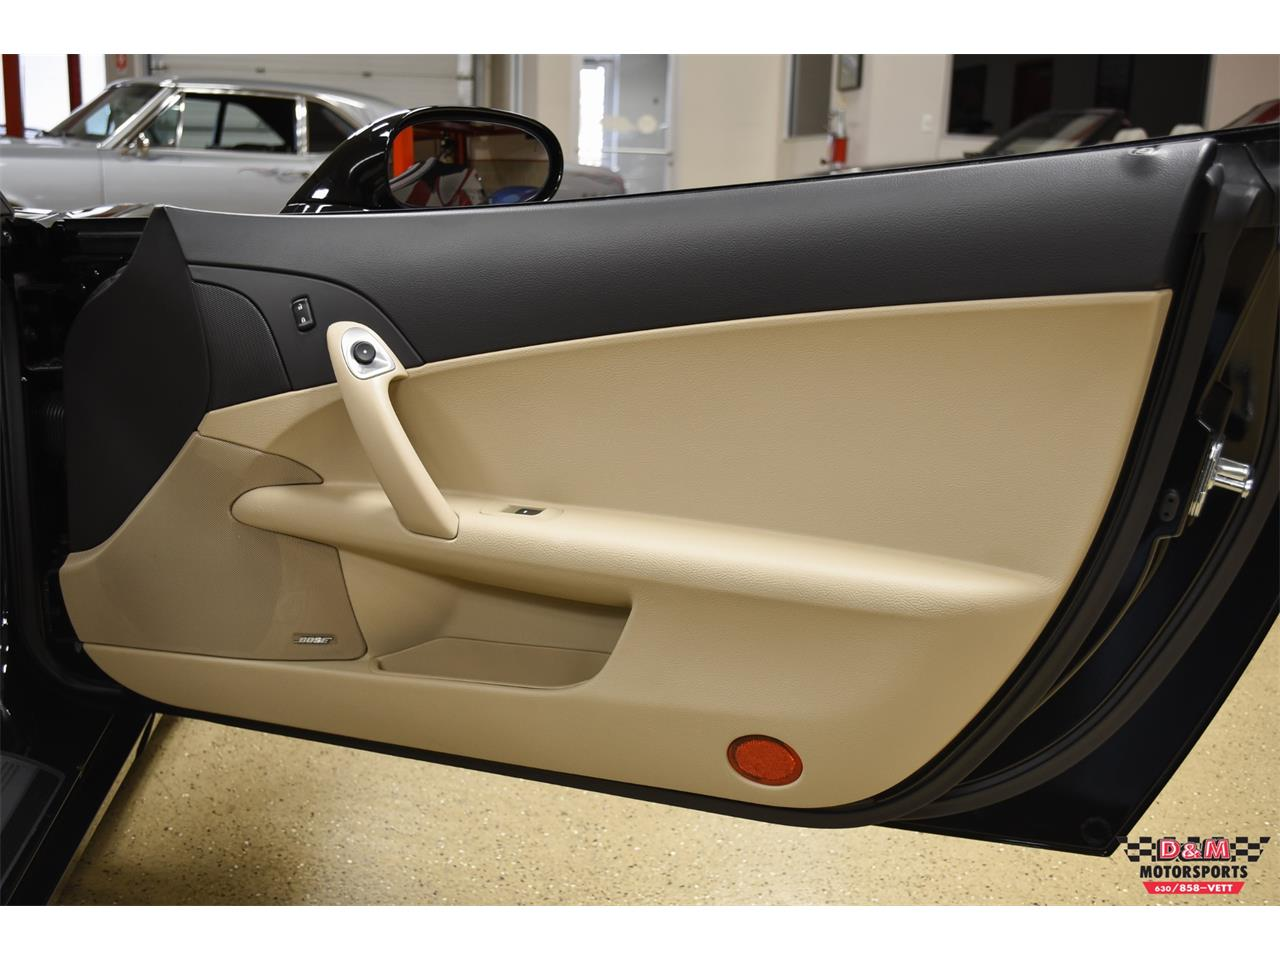 Large Picture of 2010 Chevrolet Corvette - $37,995.00 - PUJ0